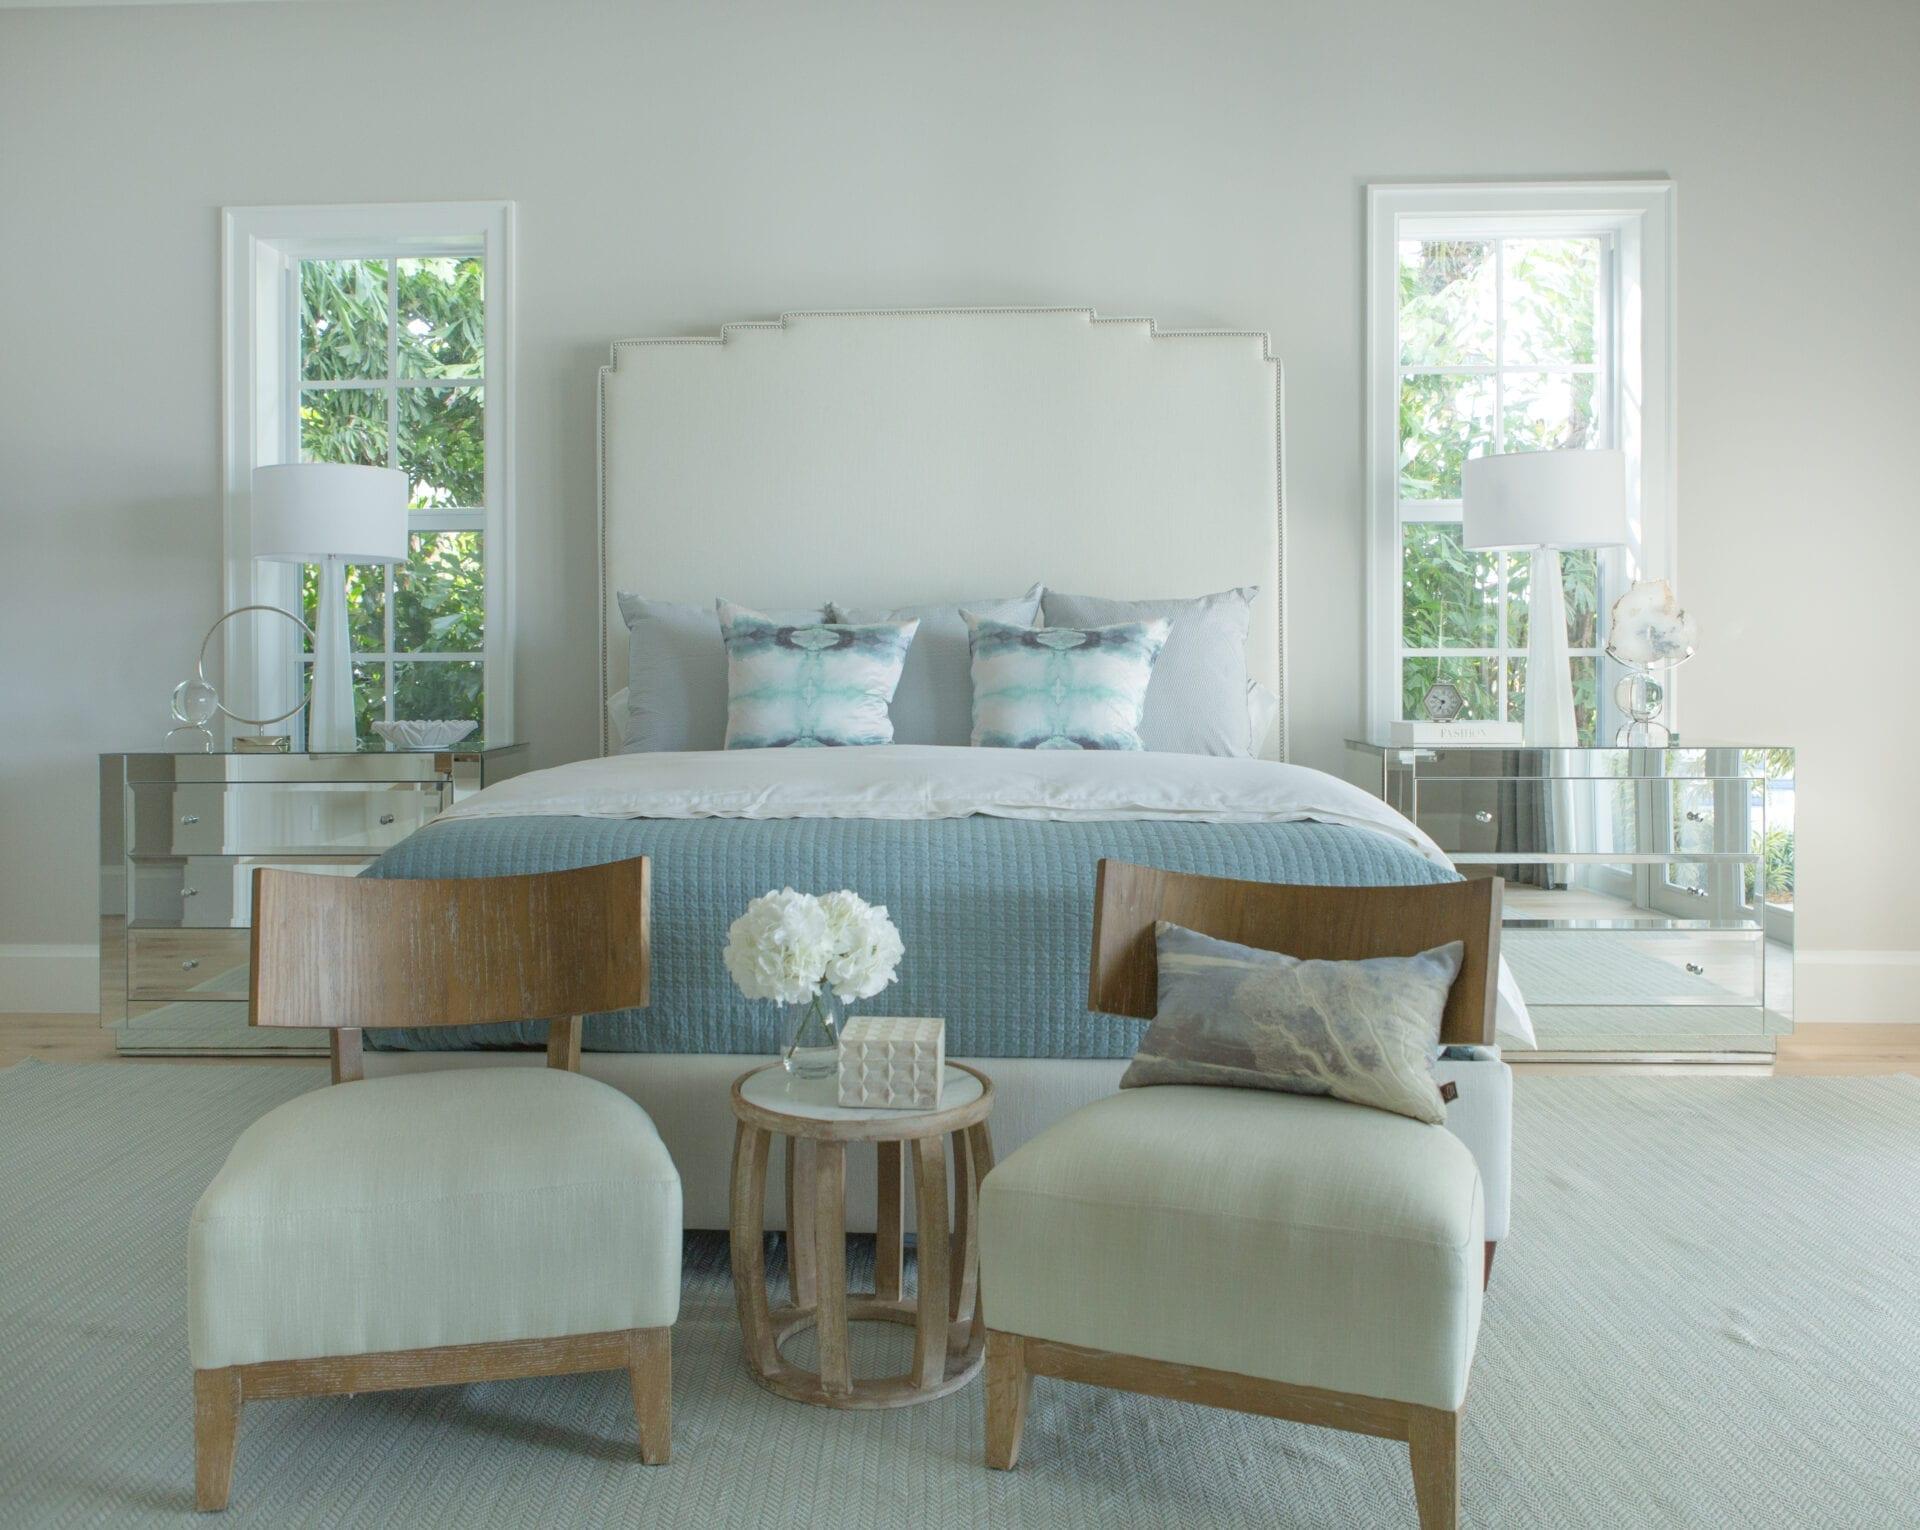 Sarasota - Wall mounted upholstered, luxury headboard with custom upholstered wall panels - Custom luxury, upholstered beds with high end, bedroom textiles   Blend Home Furnishings